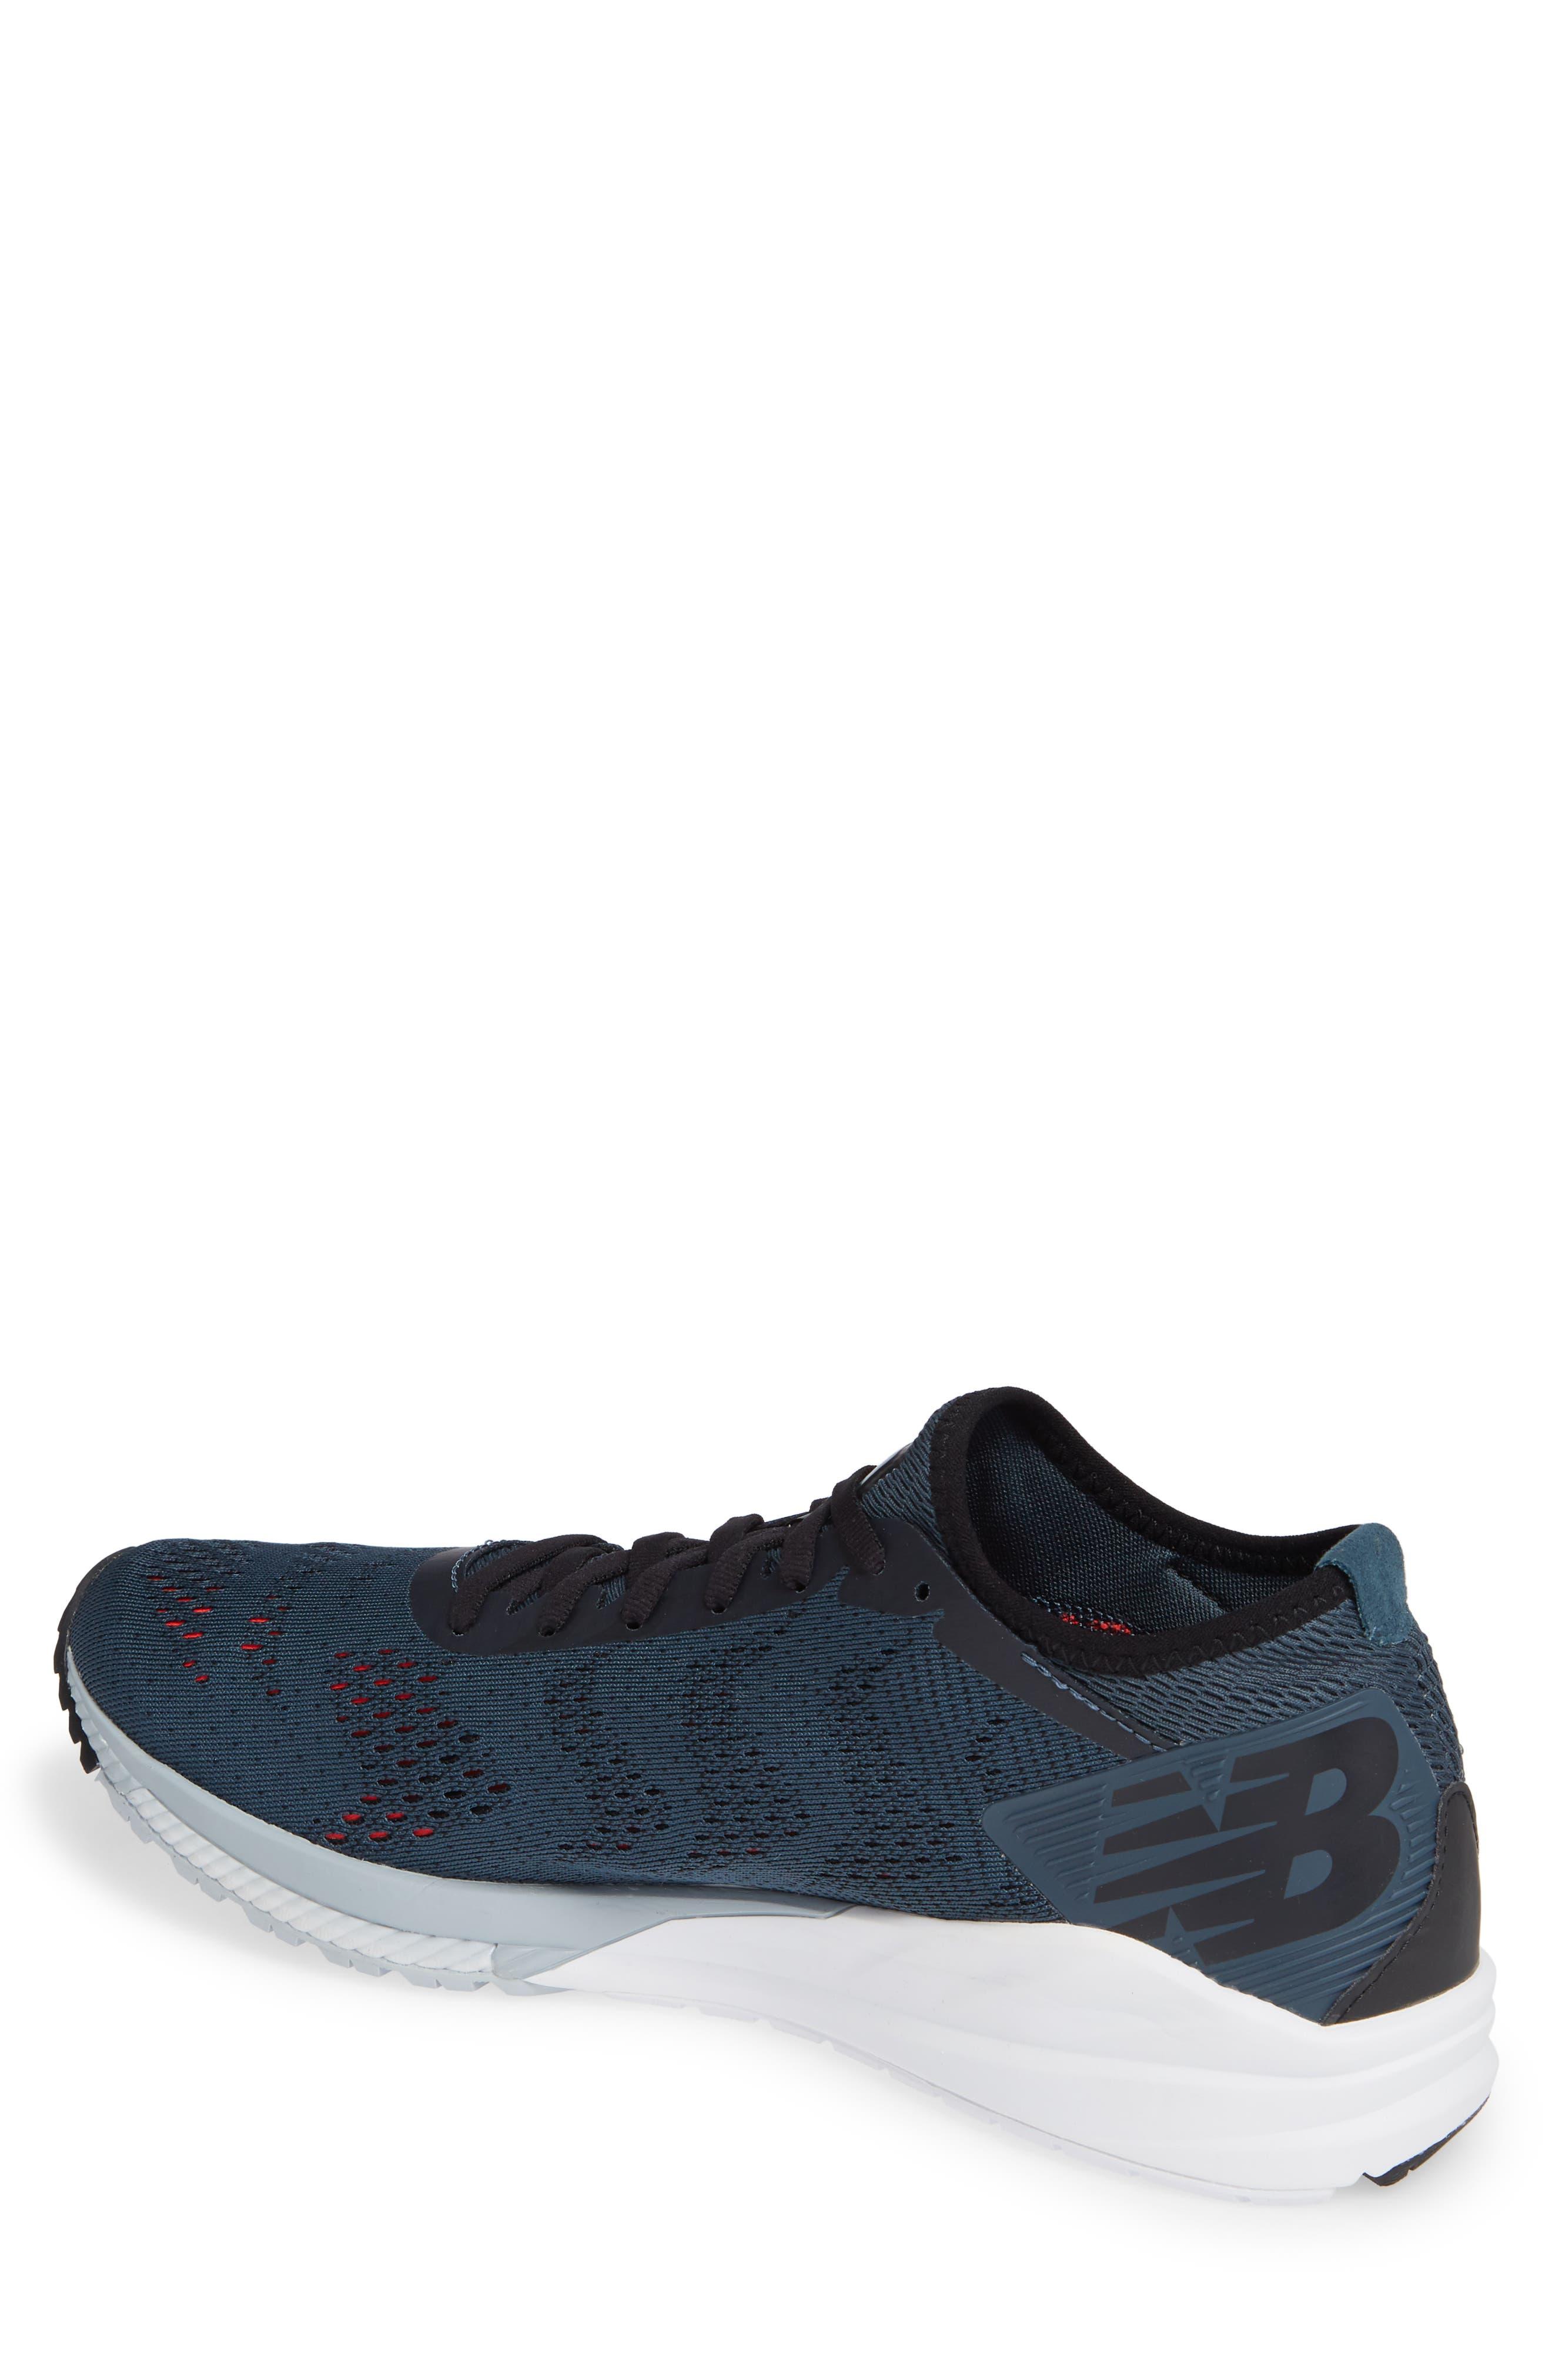 FuelCell Impulse Running Shoe,                             Alternate thumbnail 2, color,                             PETROL